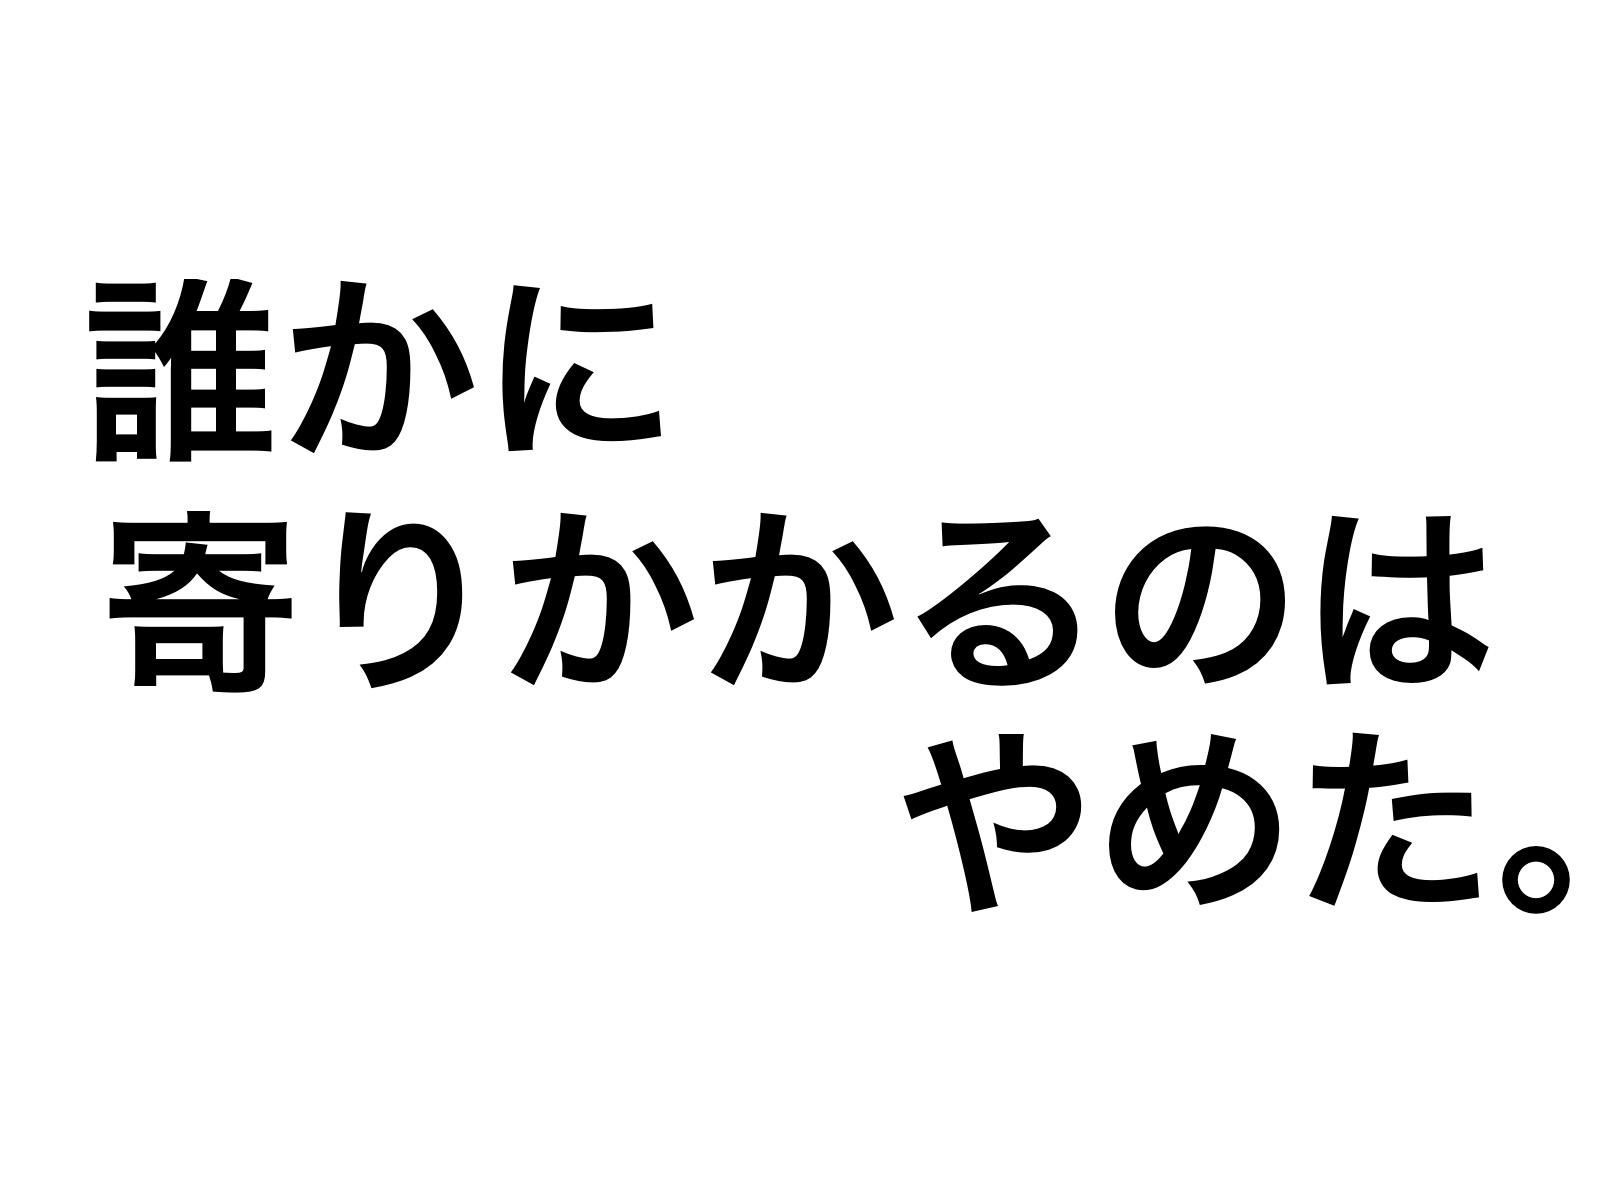 2016 08 17 22 06 25